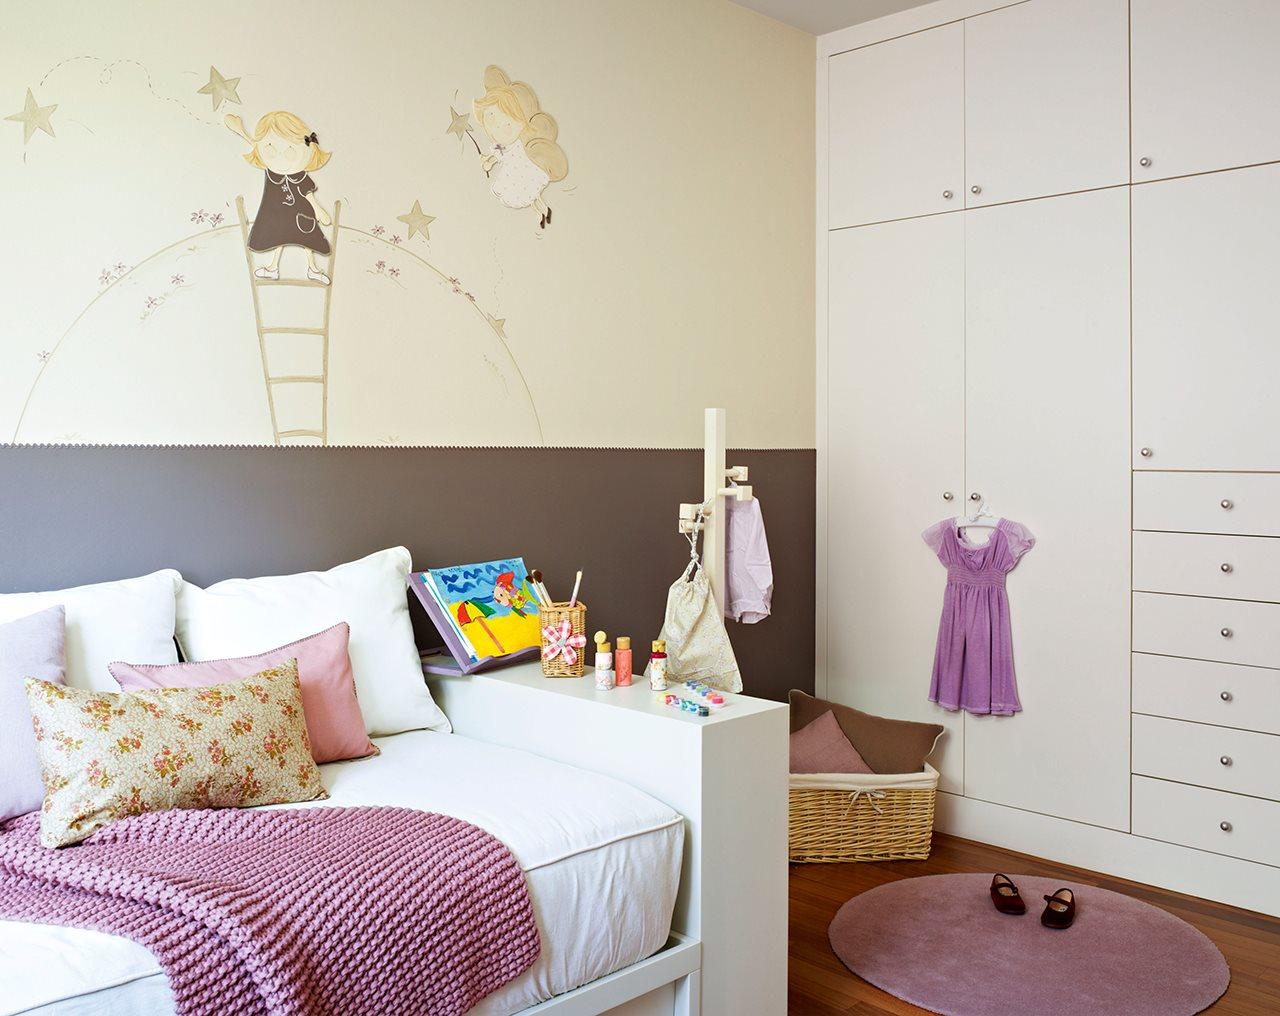 Dibujos En Paredes Interiores Fabulous Dormitorio Papel Pintado  ~ Formas De Pintar Paredes Interiores